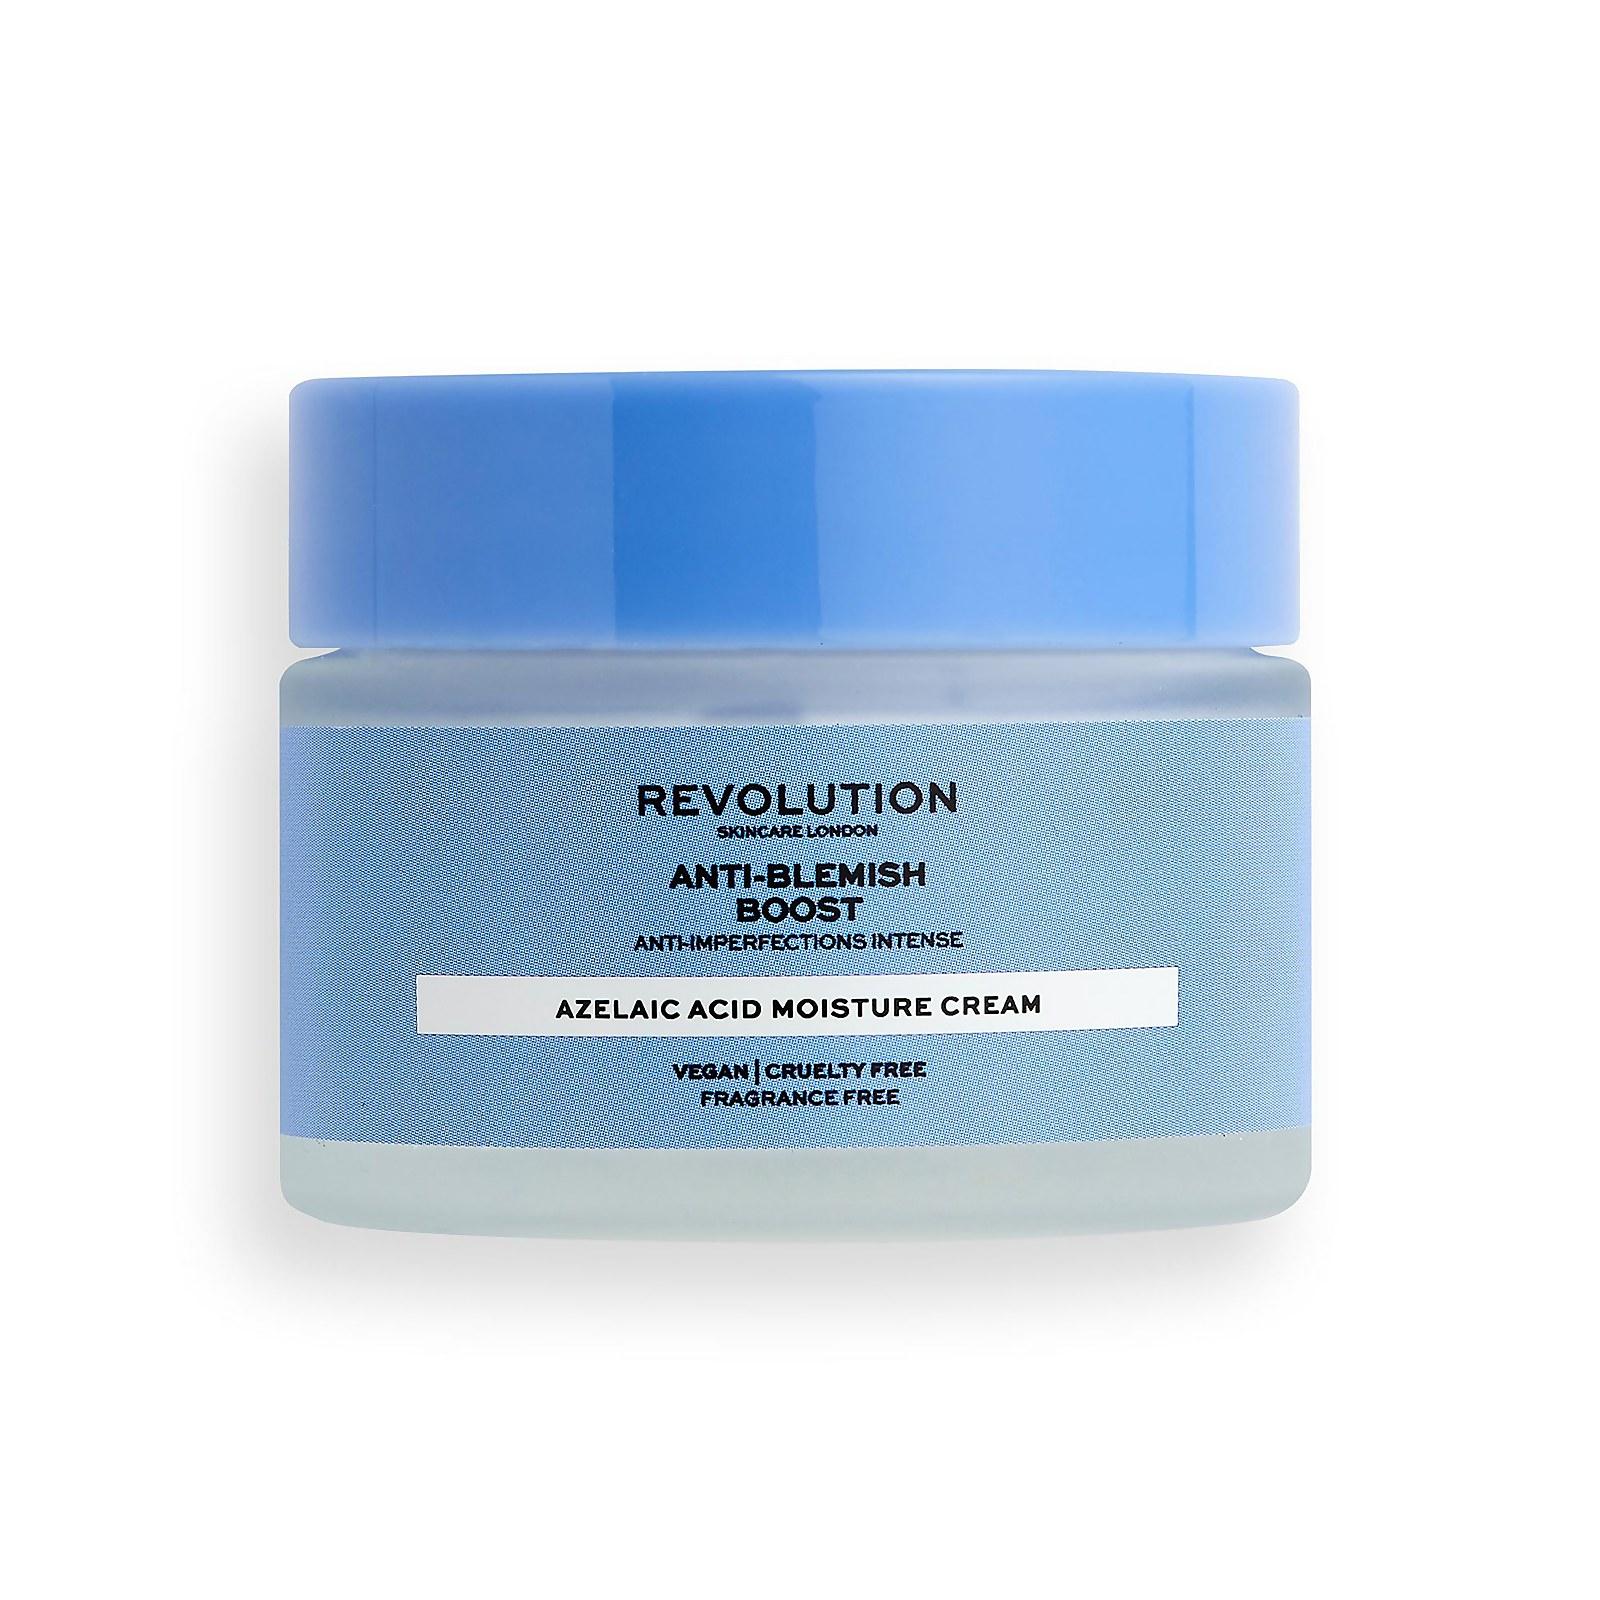 Купить Revolution Skincare Anti-Blemish Boost Cream with Azelaic Acid 50ml